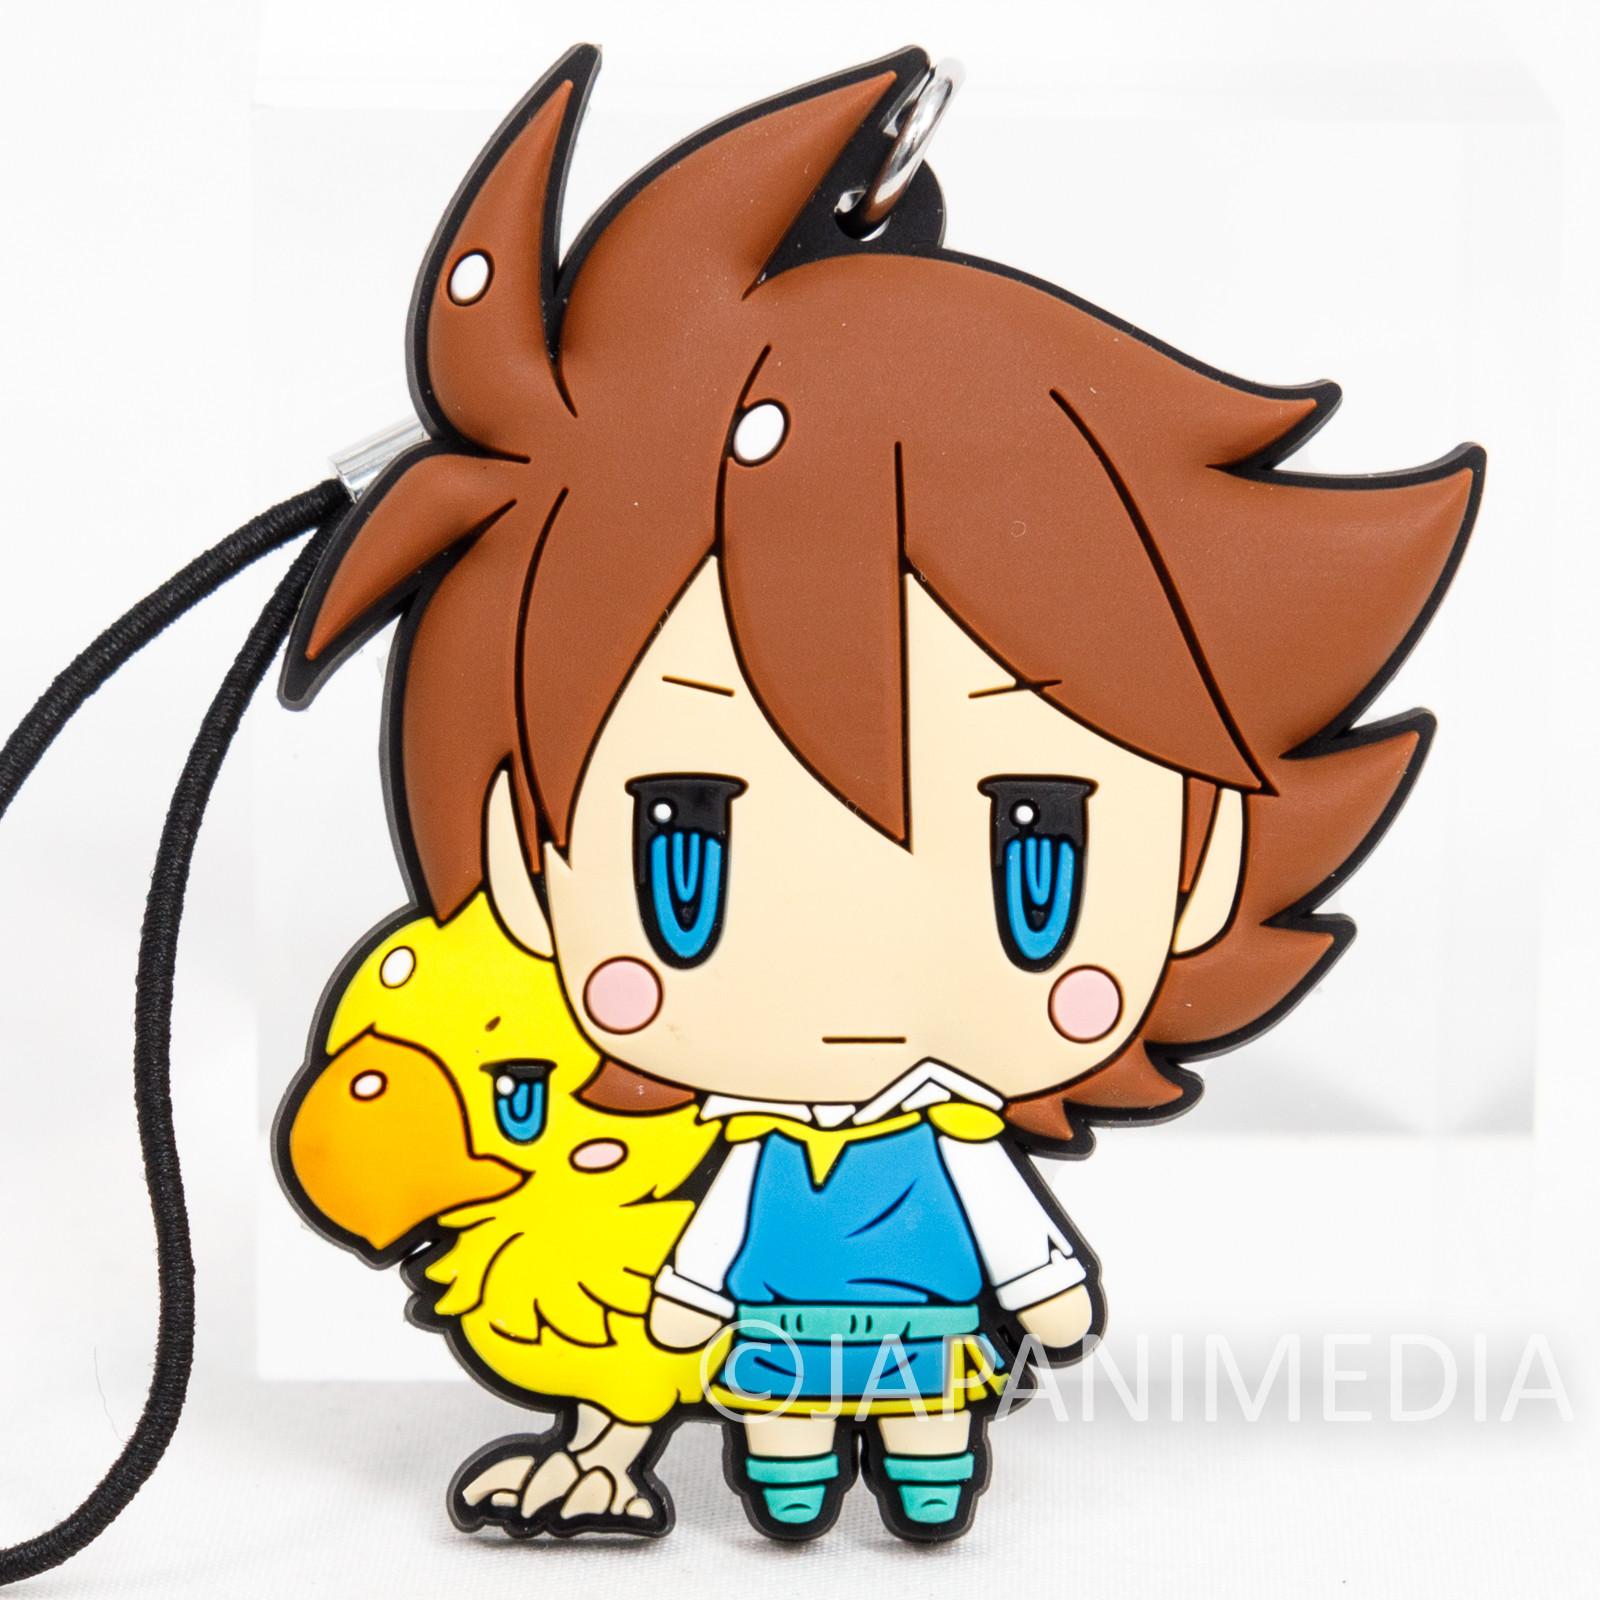 Final Fantasy Bartz Klauser Chocobo Mascot Rubber Strap JAPAN SQUARE ENIX